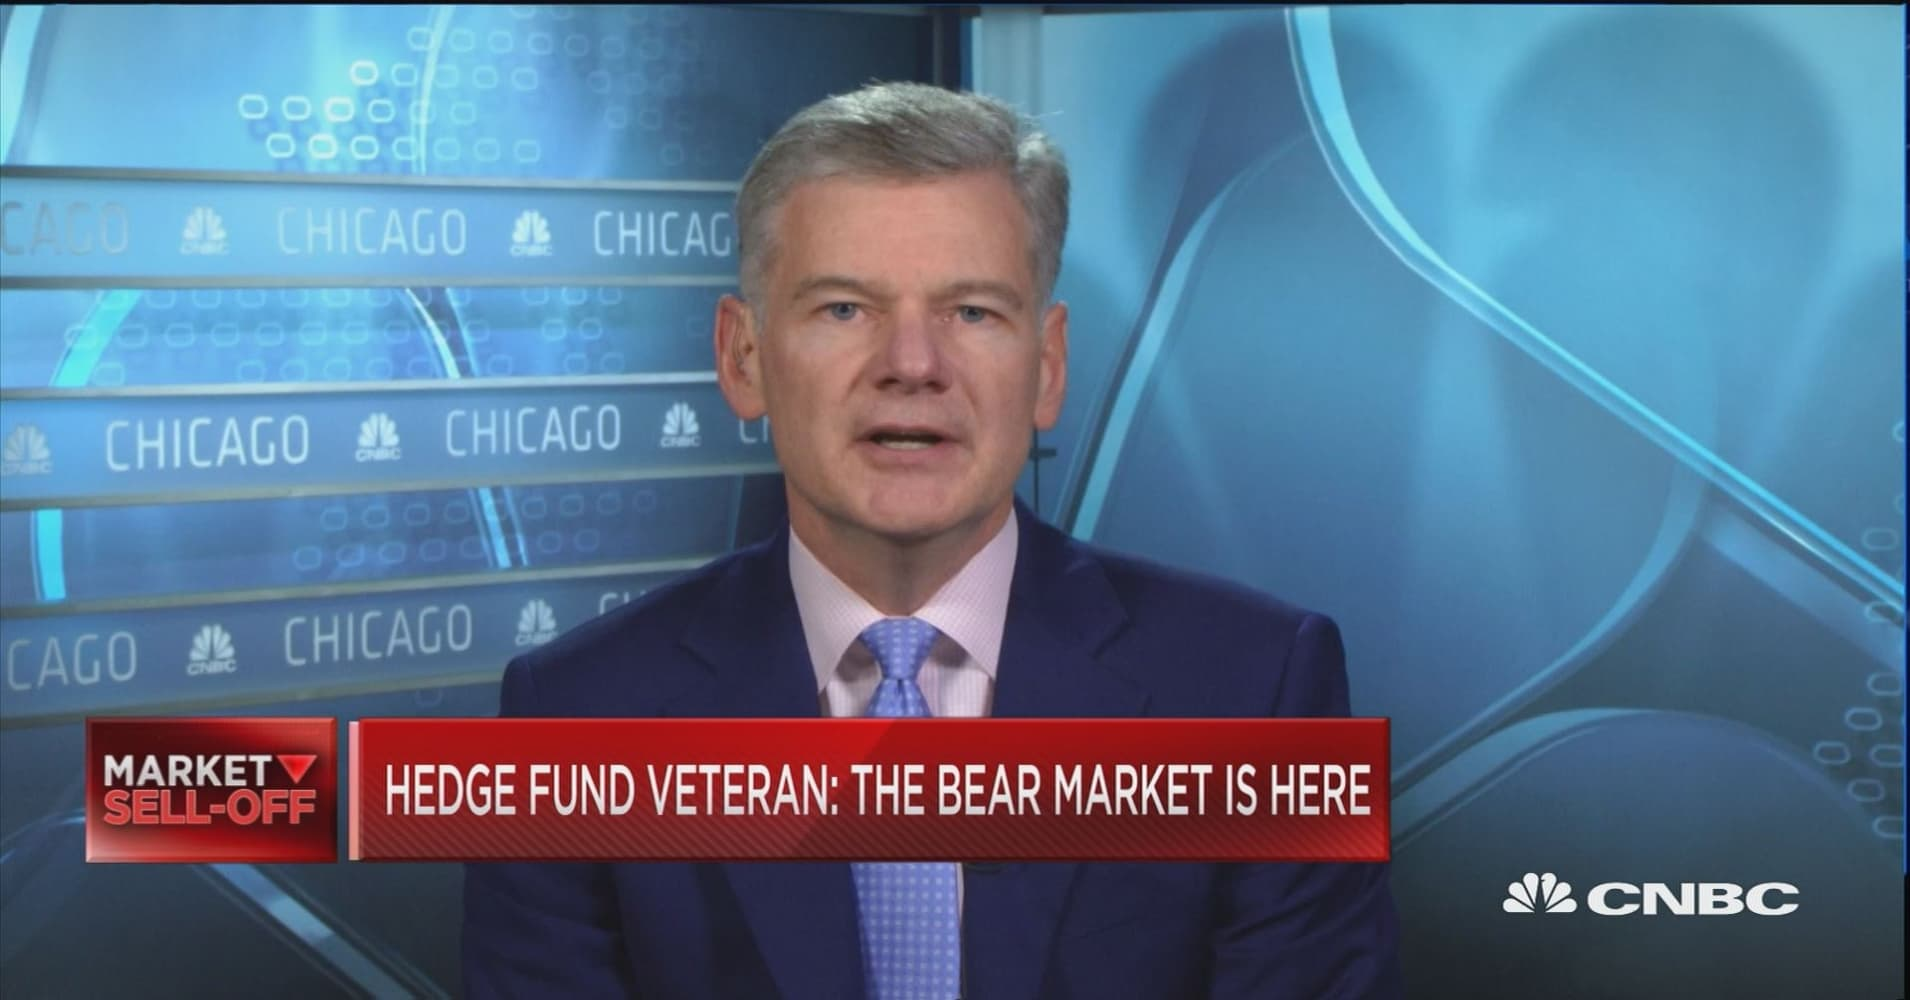 Hedge-fund veteran Mark Yusko is predicting a 'dreadful bear market' in 2019